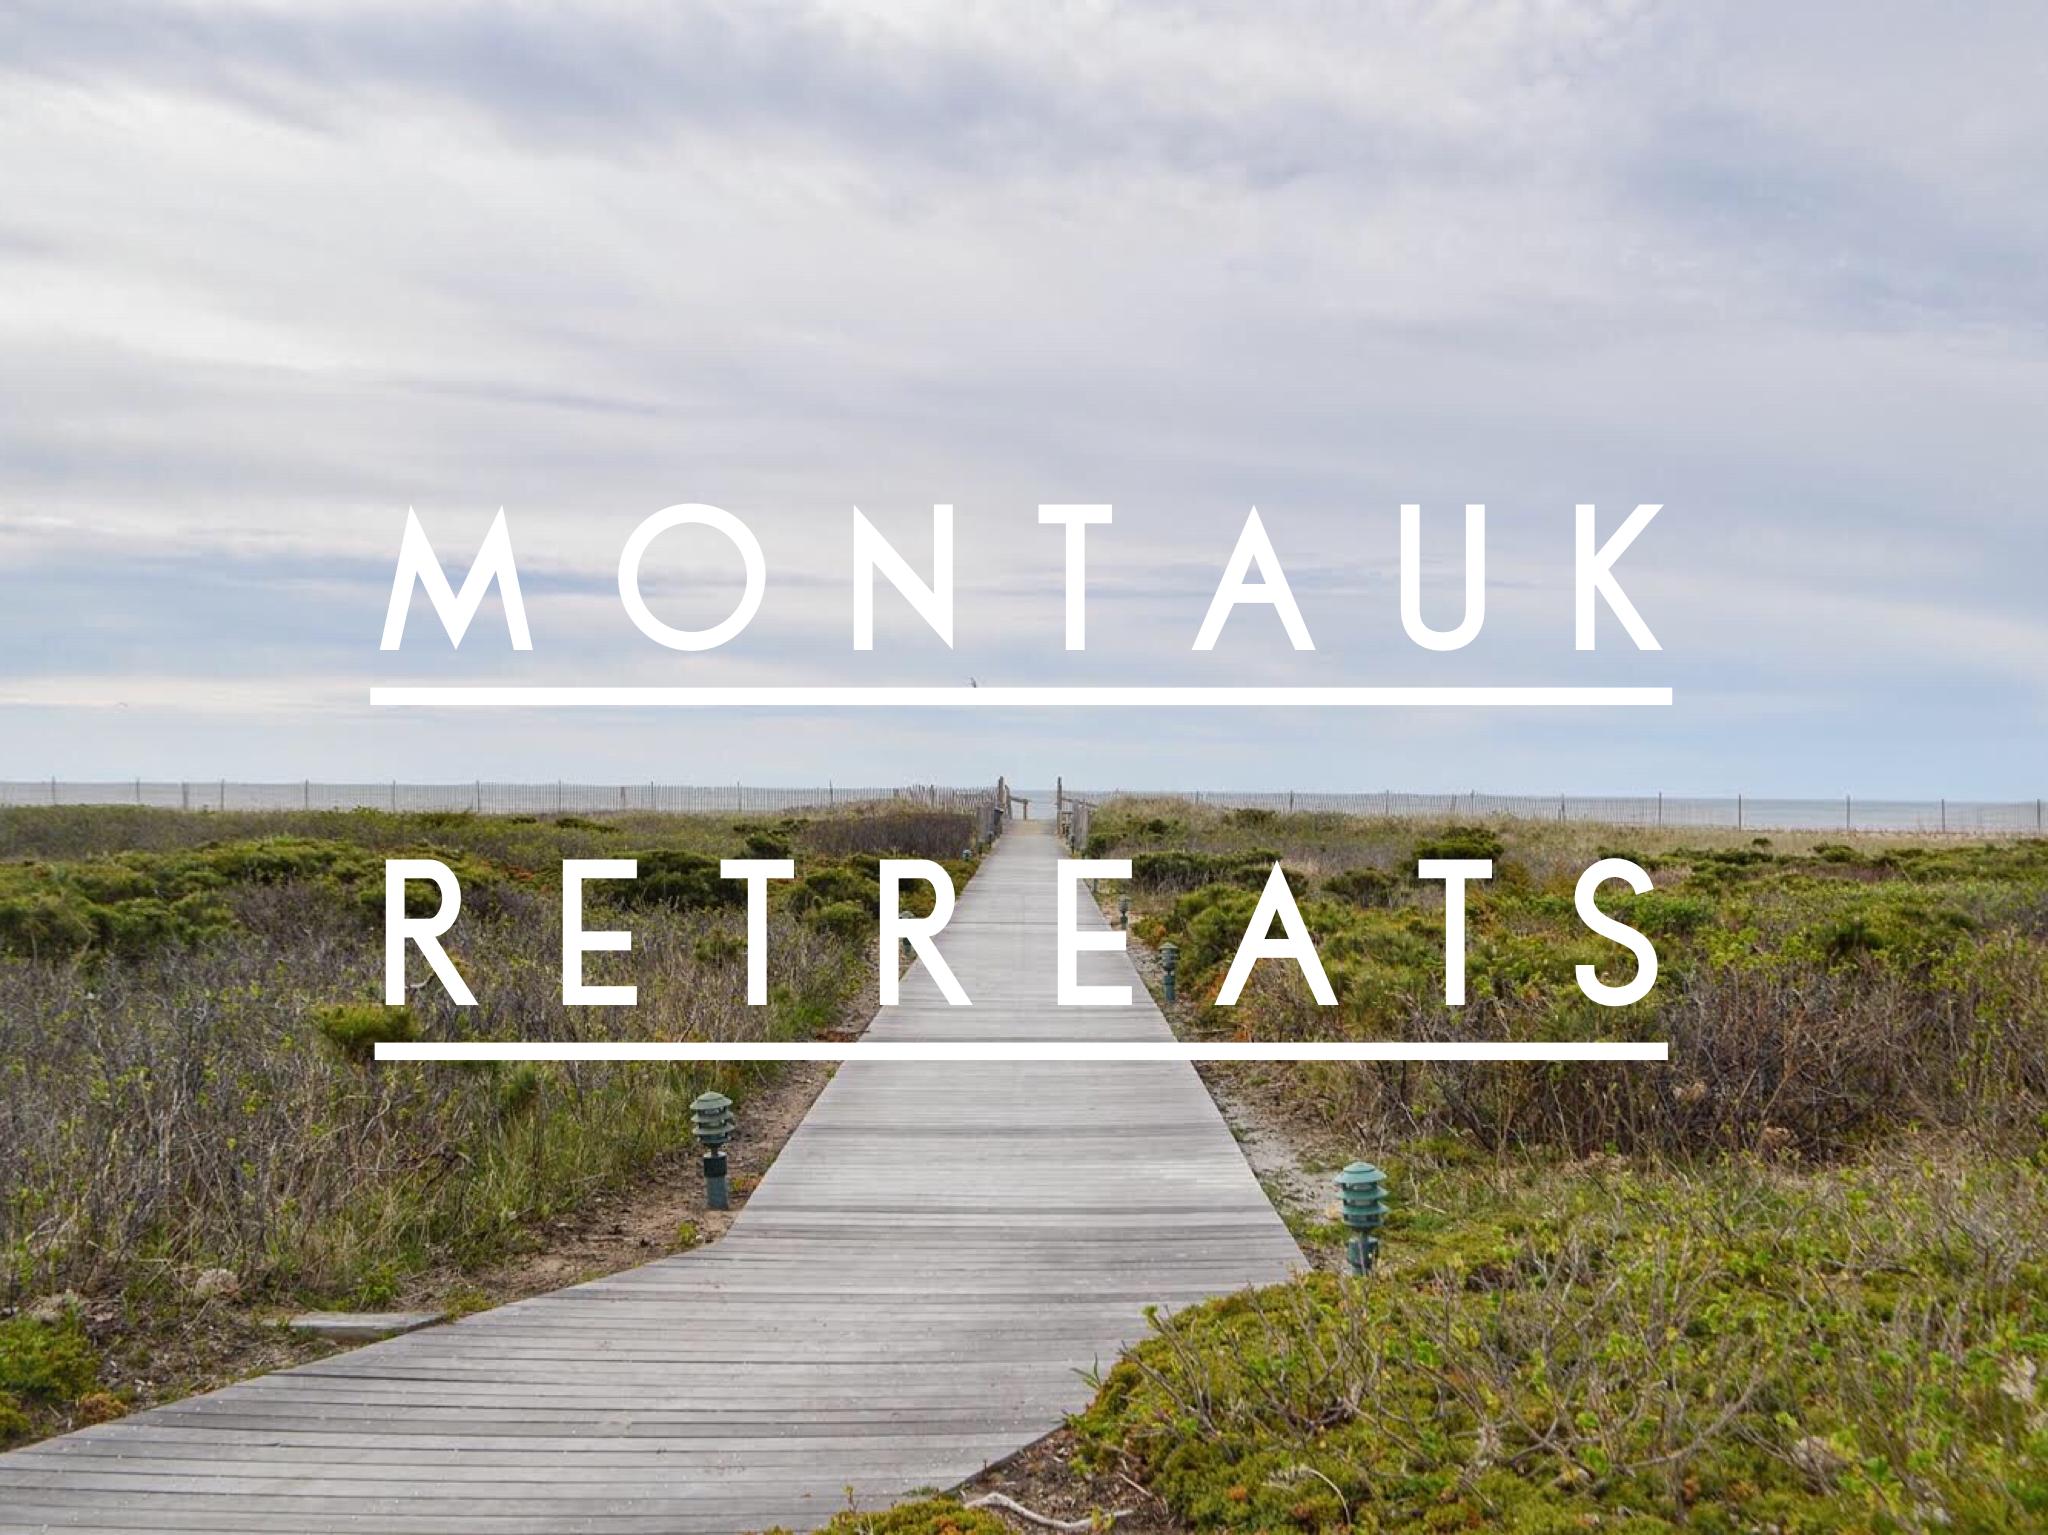 Montauk Retrets.PNG